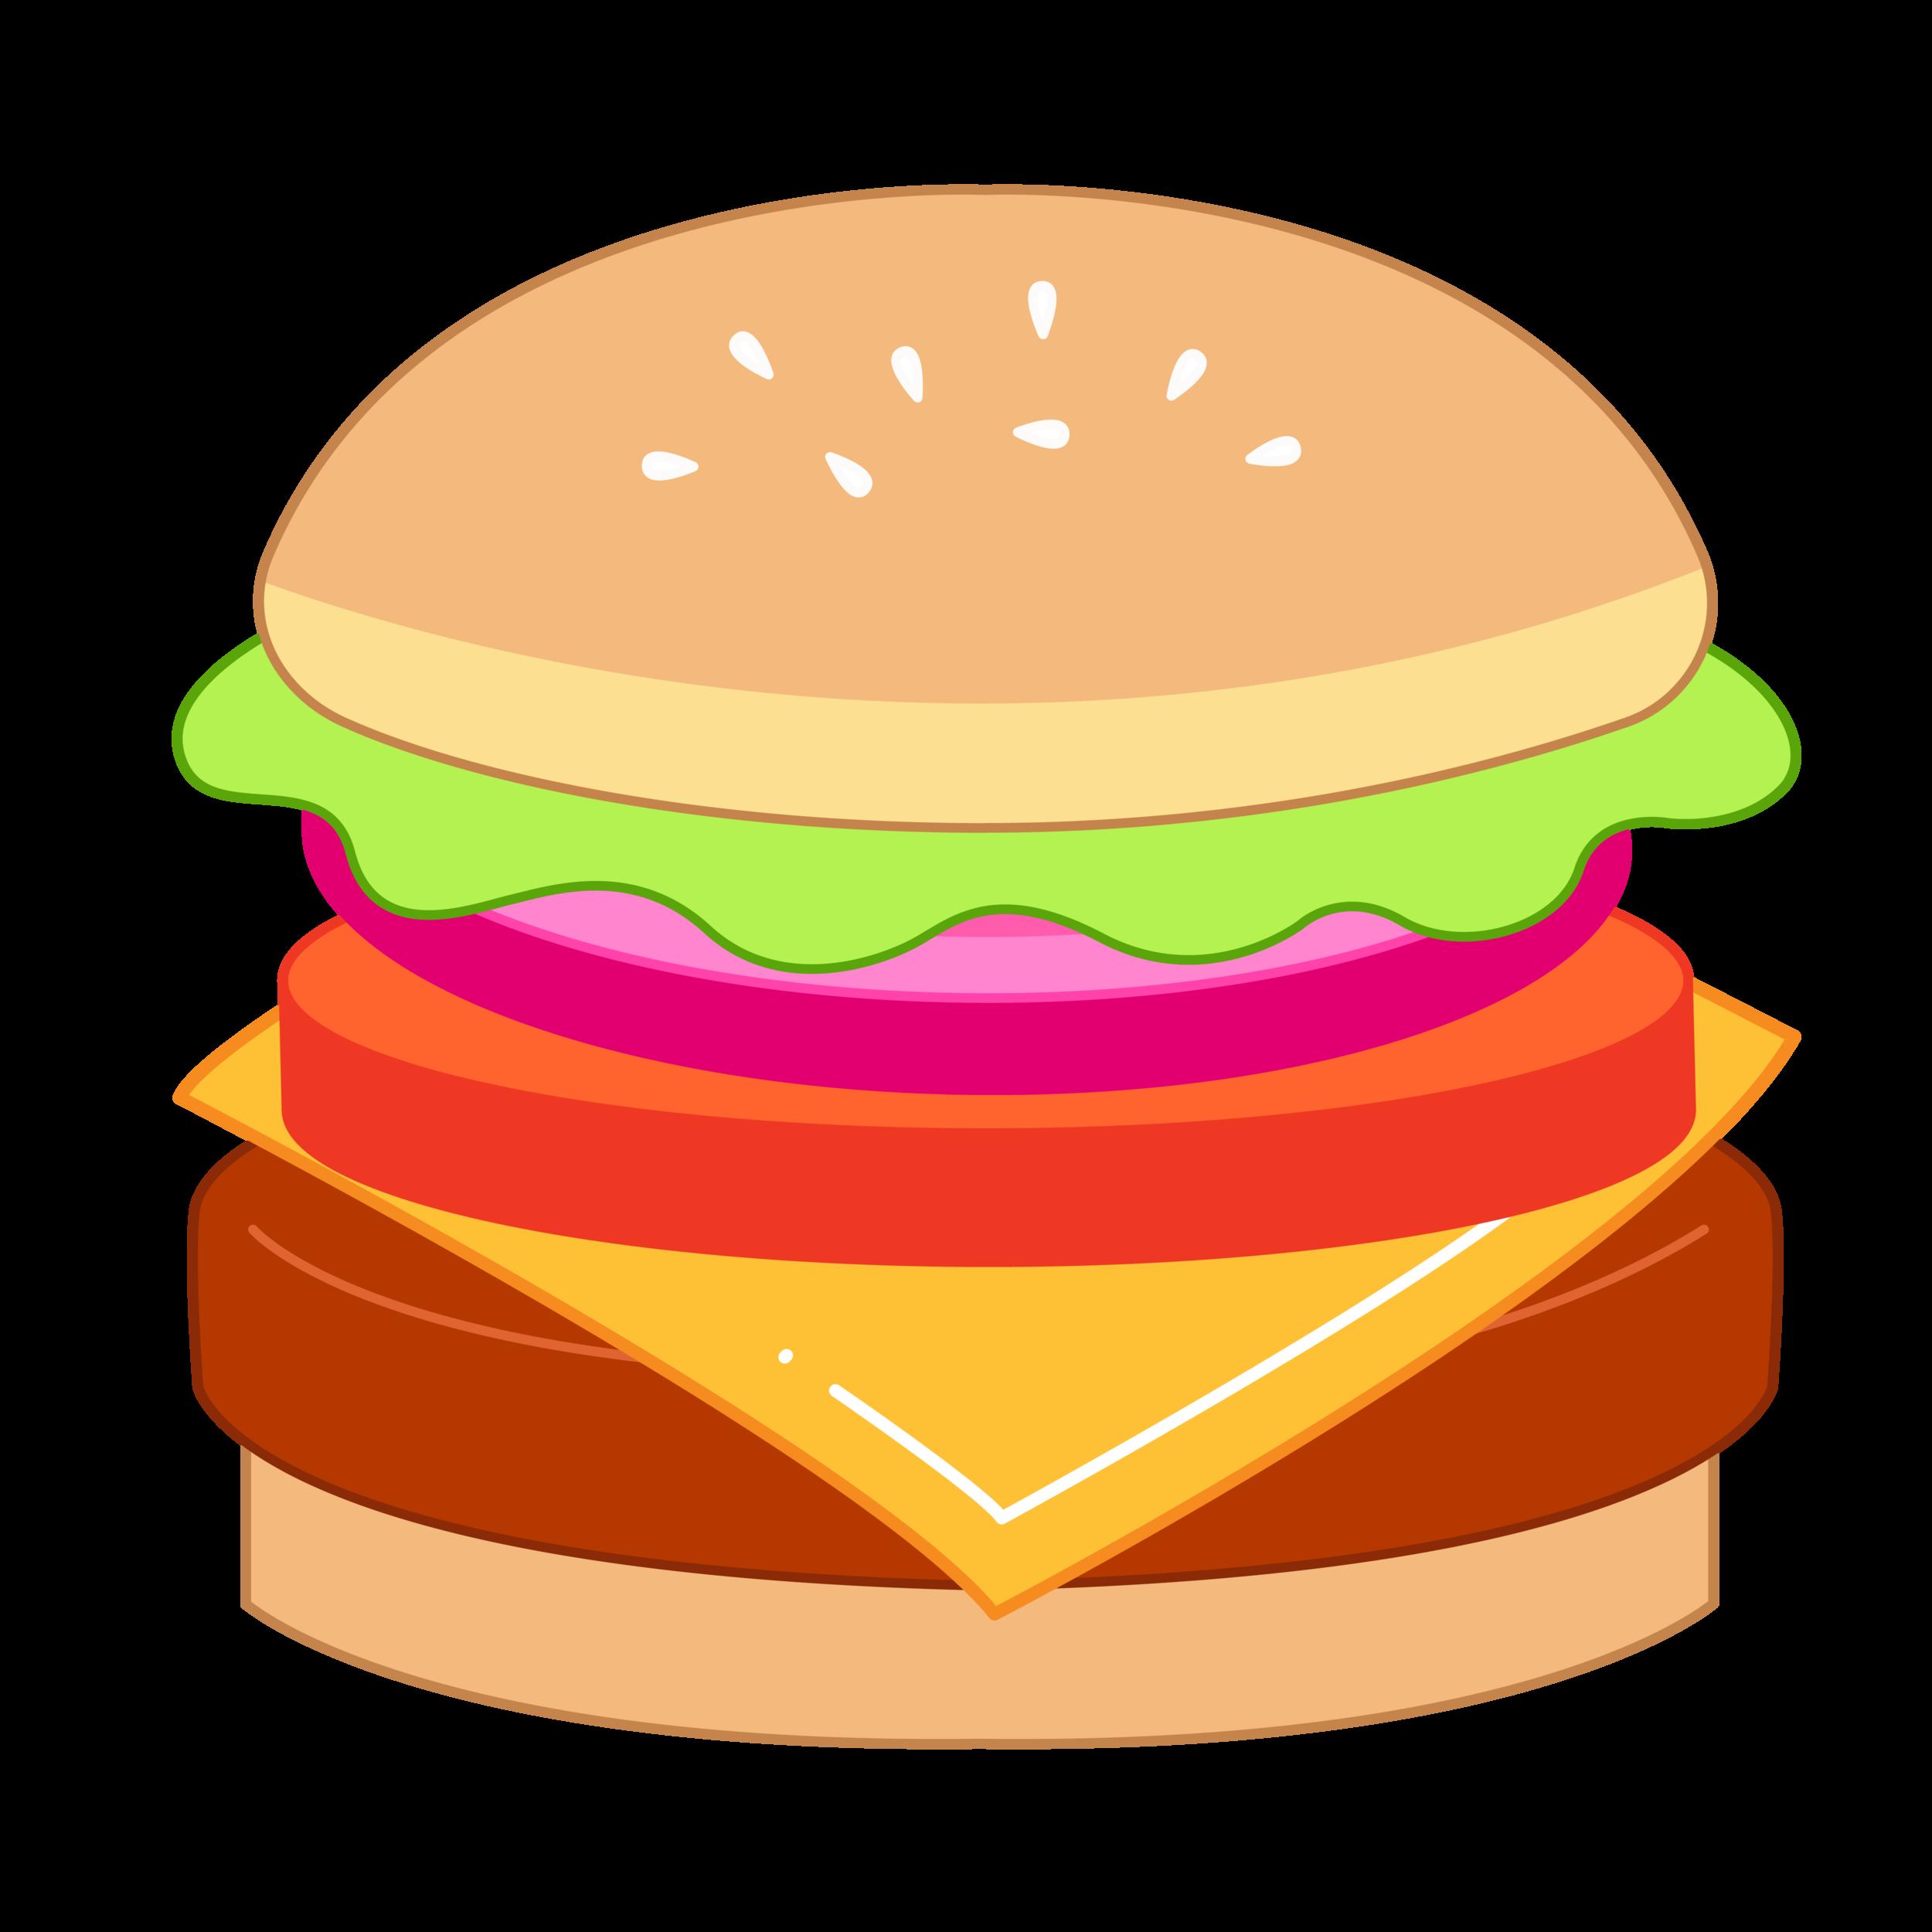 foods-01.png